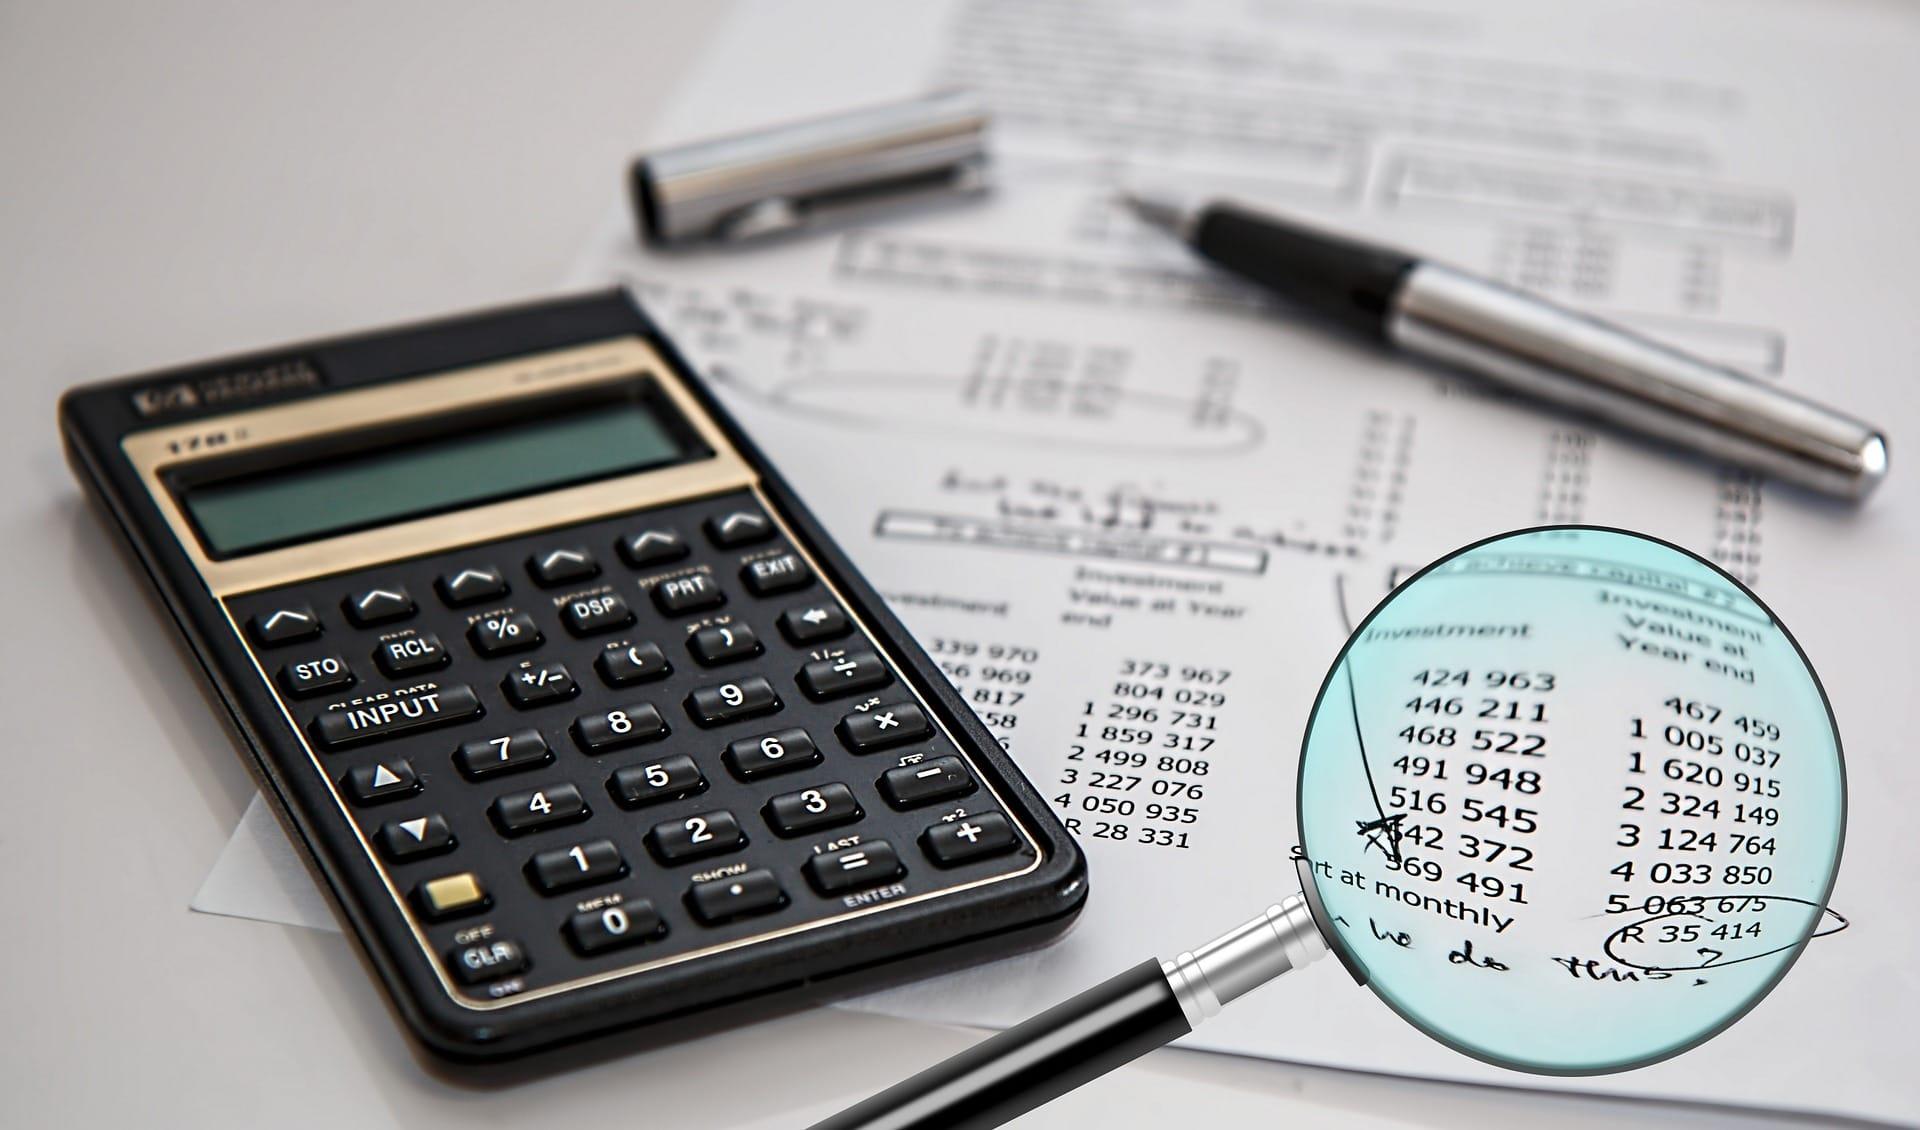 Audit Rechnungsprüfer Analyse Prüfung Dokument - (c) Pixabay